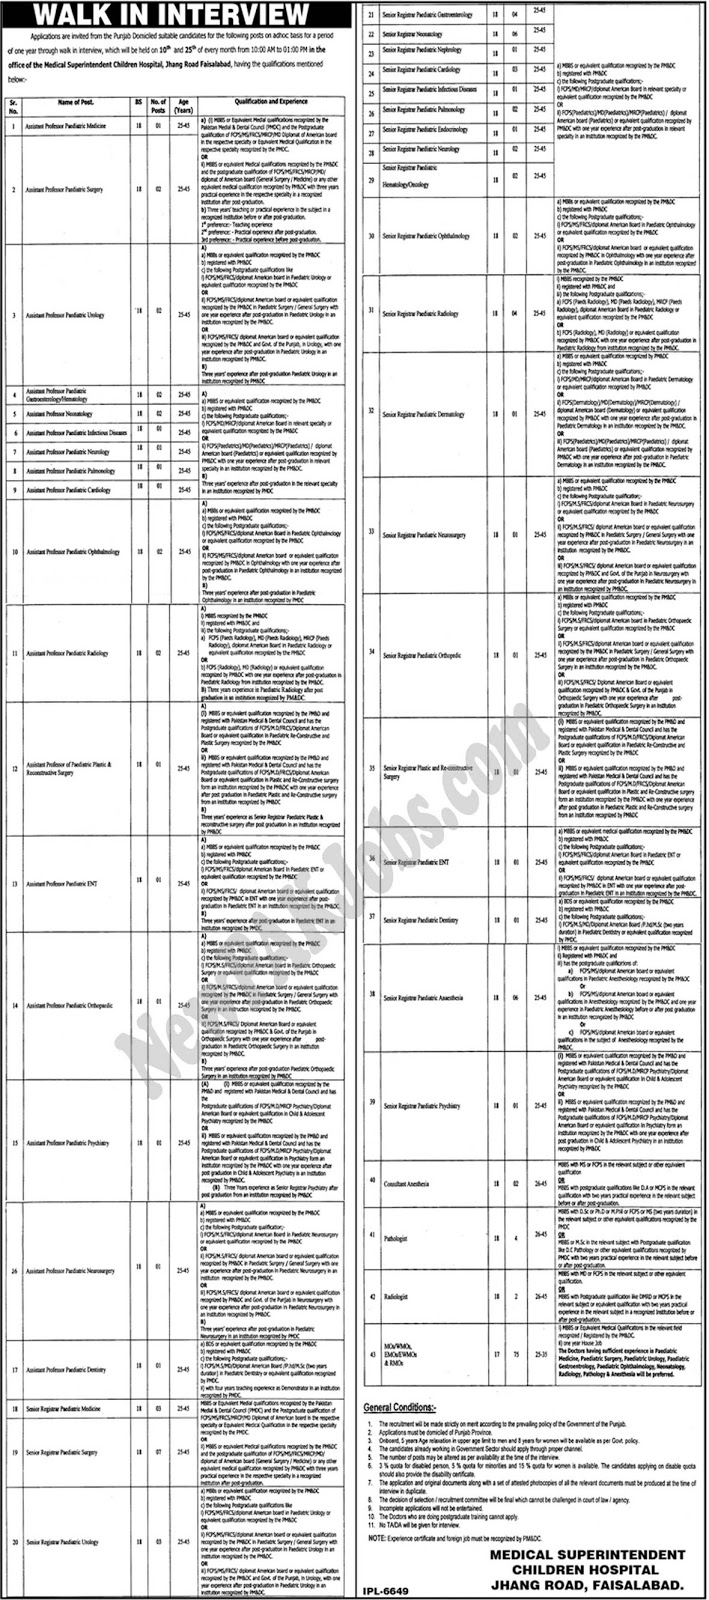 Walk-in Interview Jobs in Children Hospital Faisalabad MBBS Latest Jobs June 2018